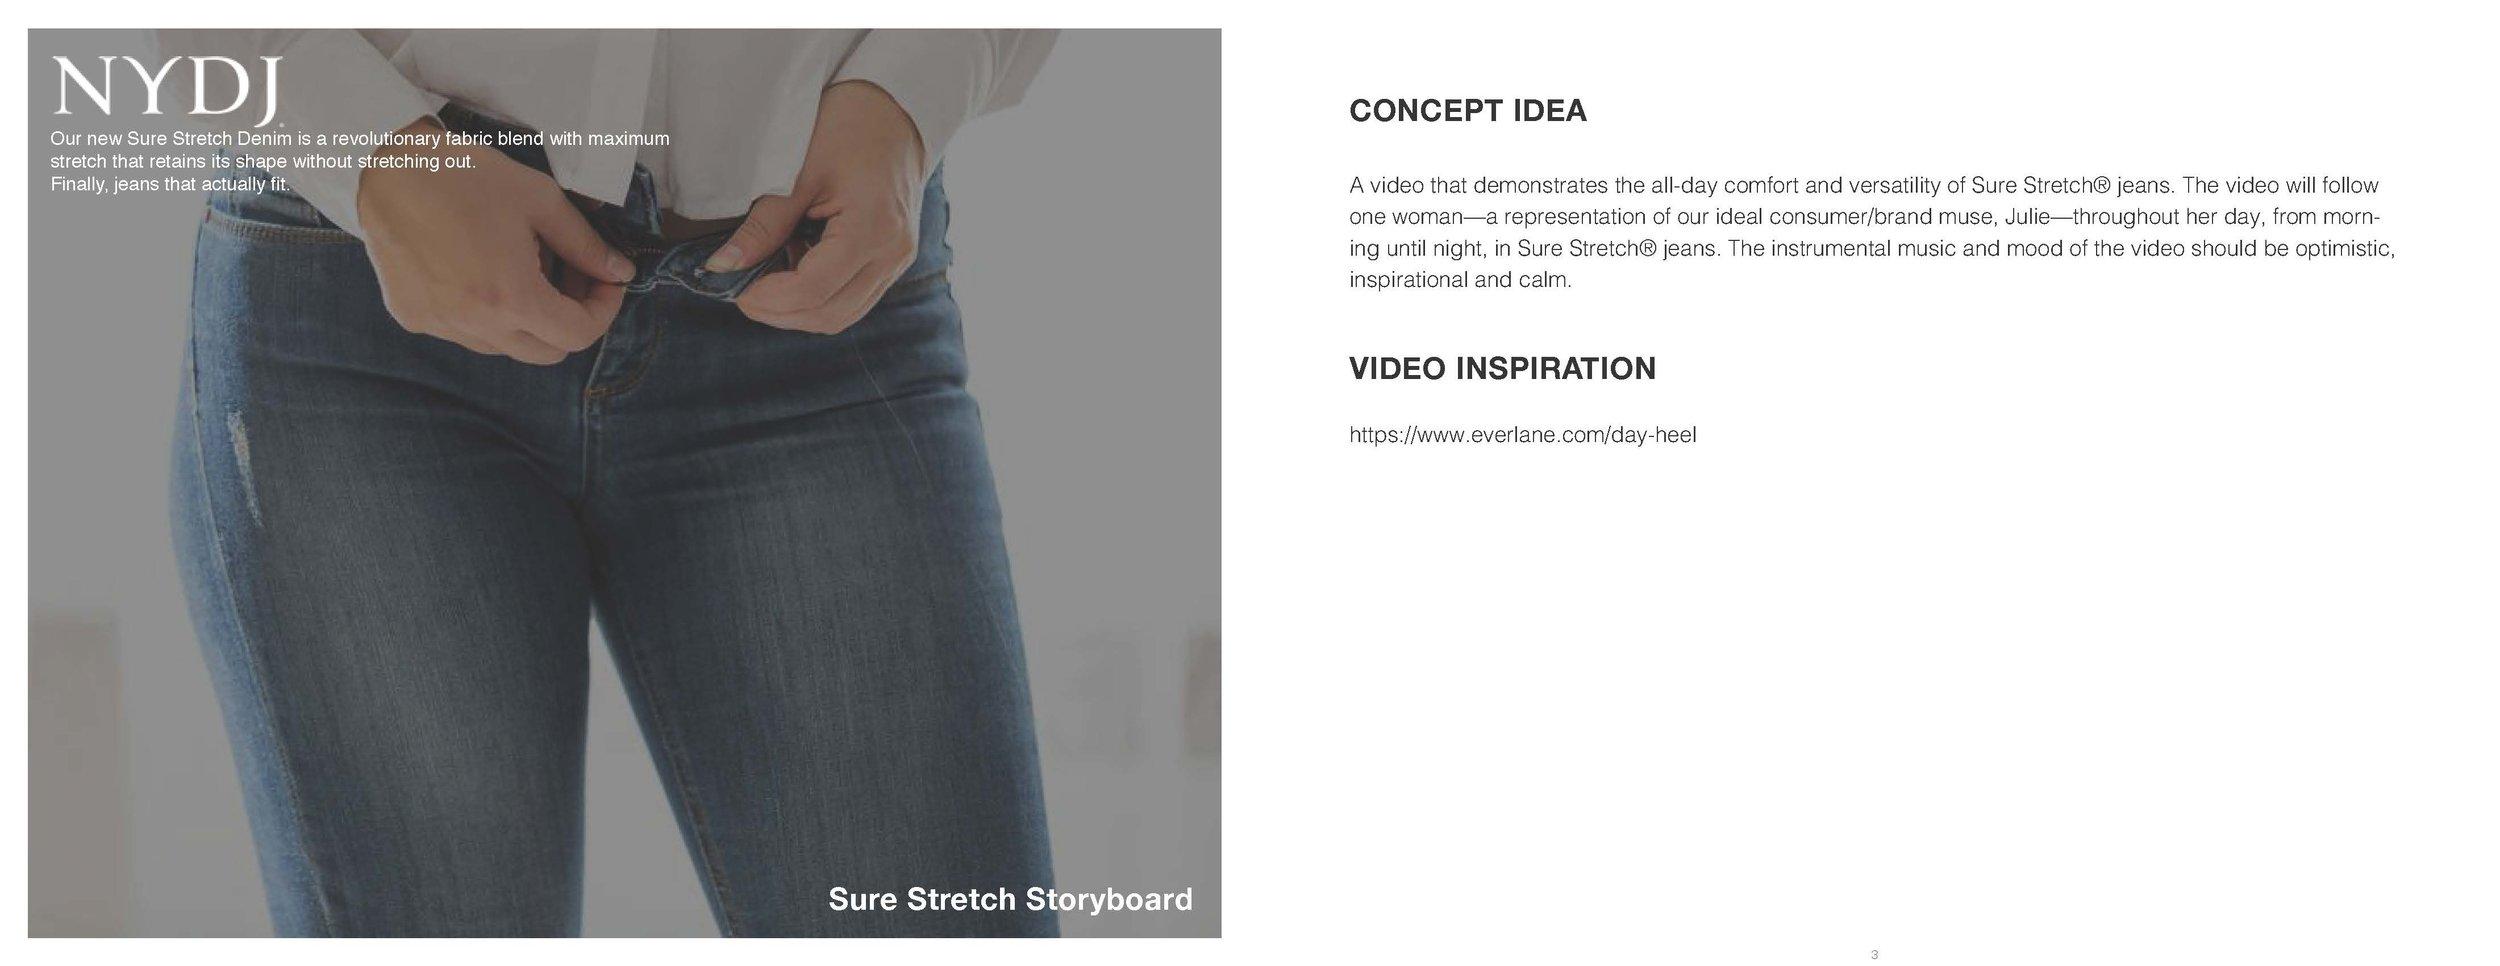 NYDJ_SURE_STRETCH_VIDEO_STORYBOARD_01_Page_02.jpg